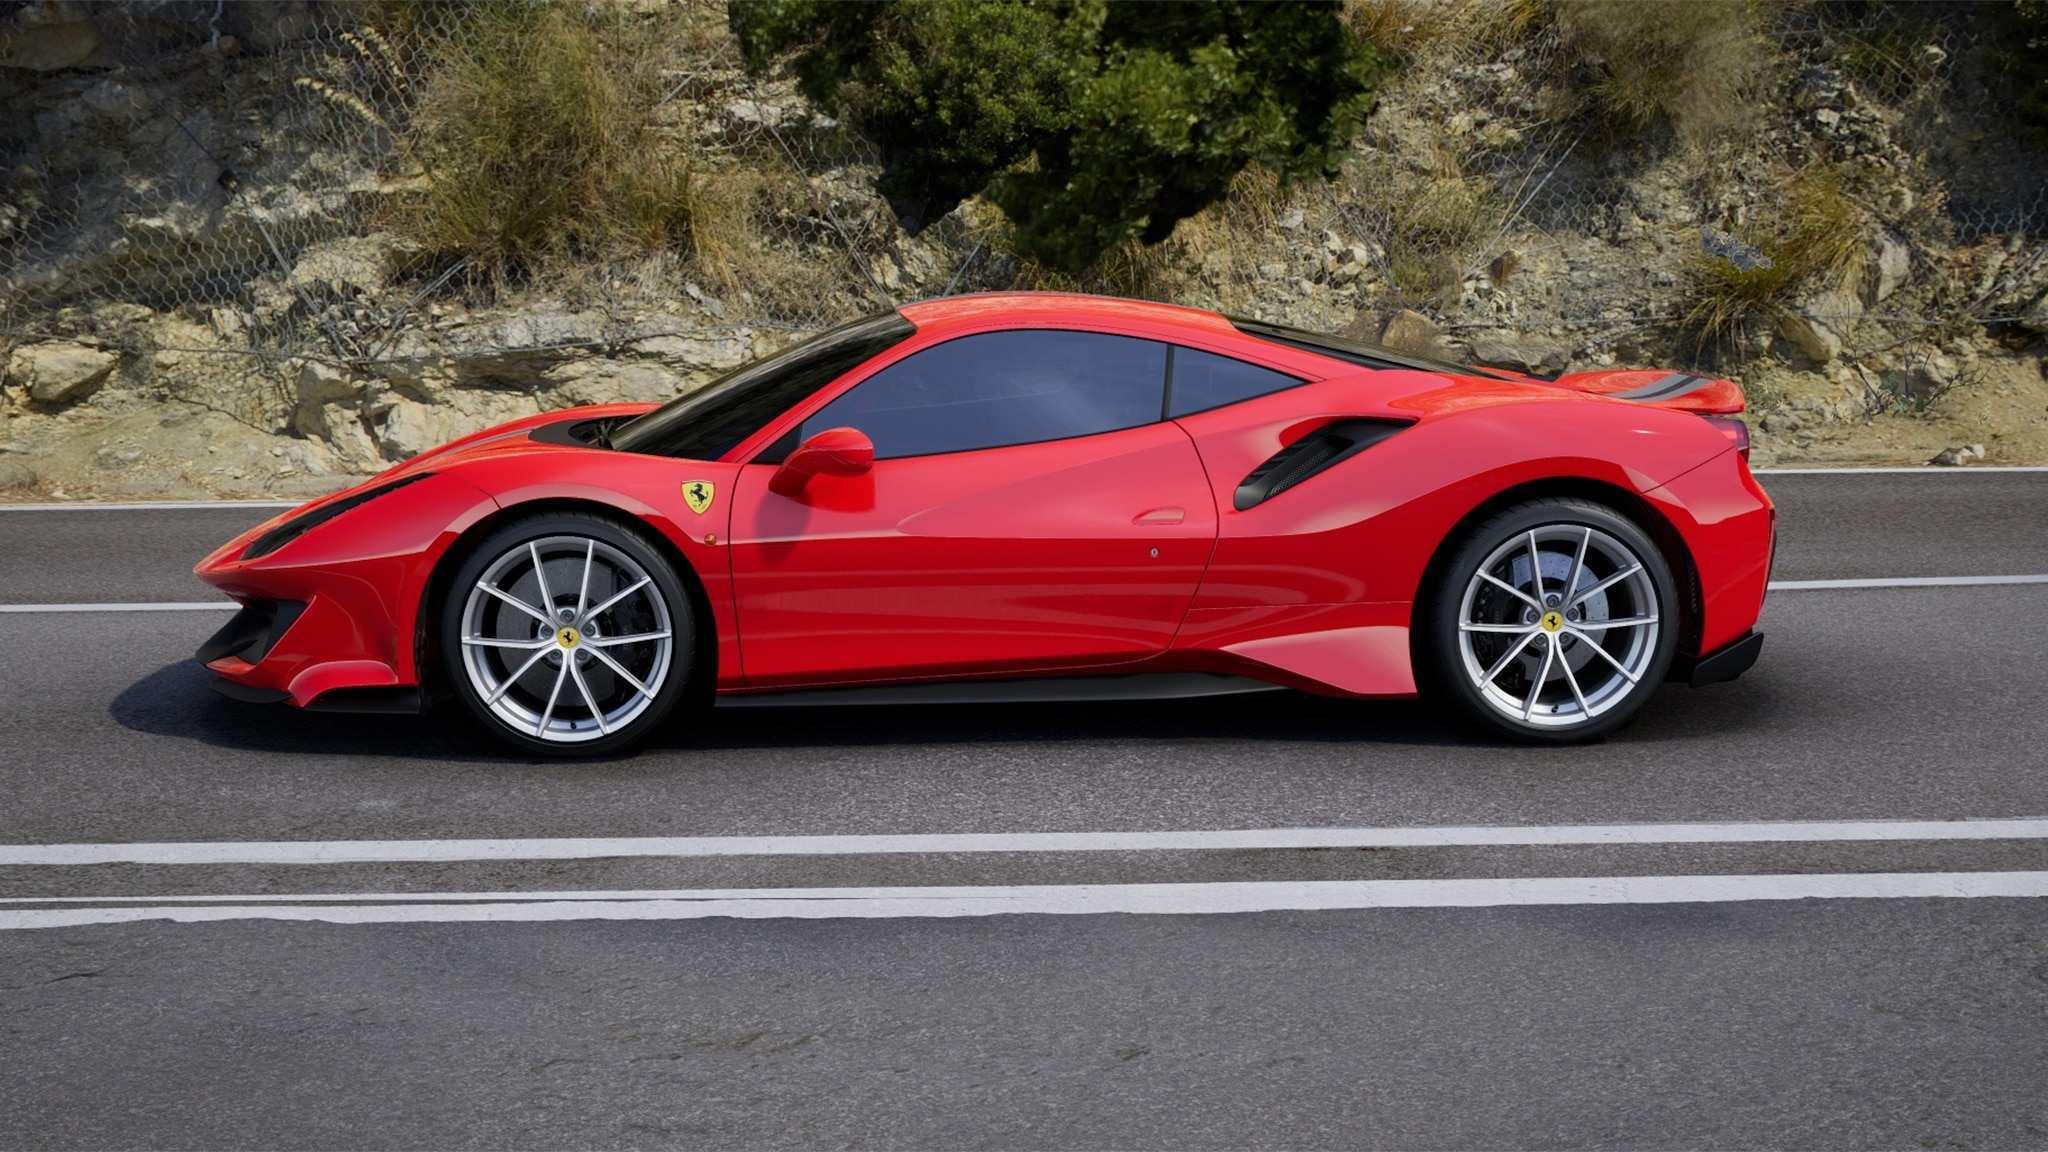 32 New The 2019 White Ferrari Spesification Specs by The 2019 White Ferrari Spesification